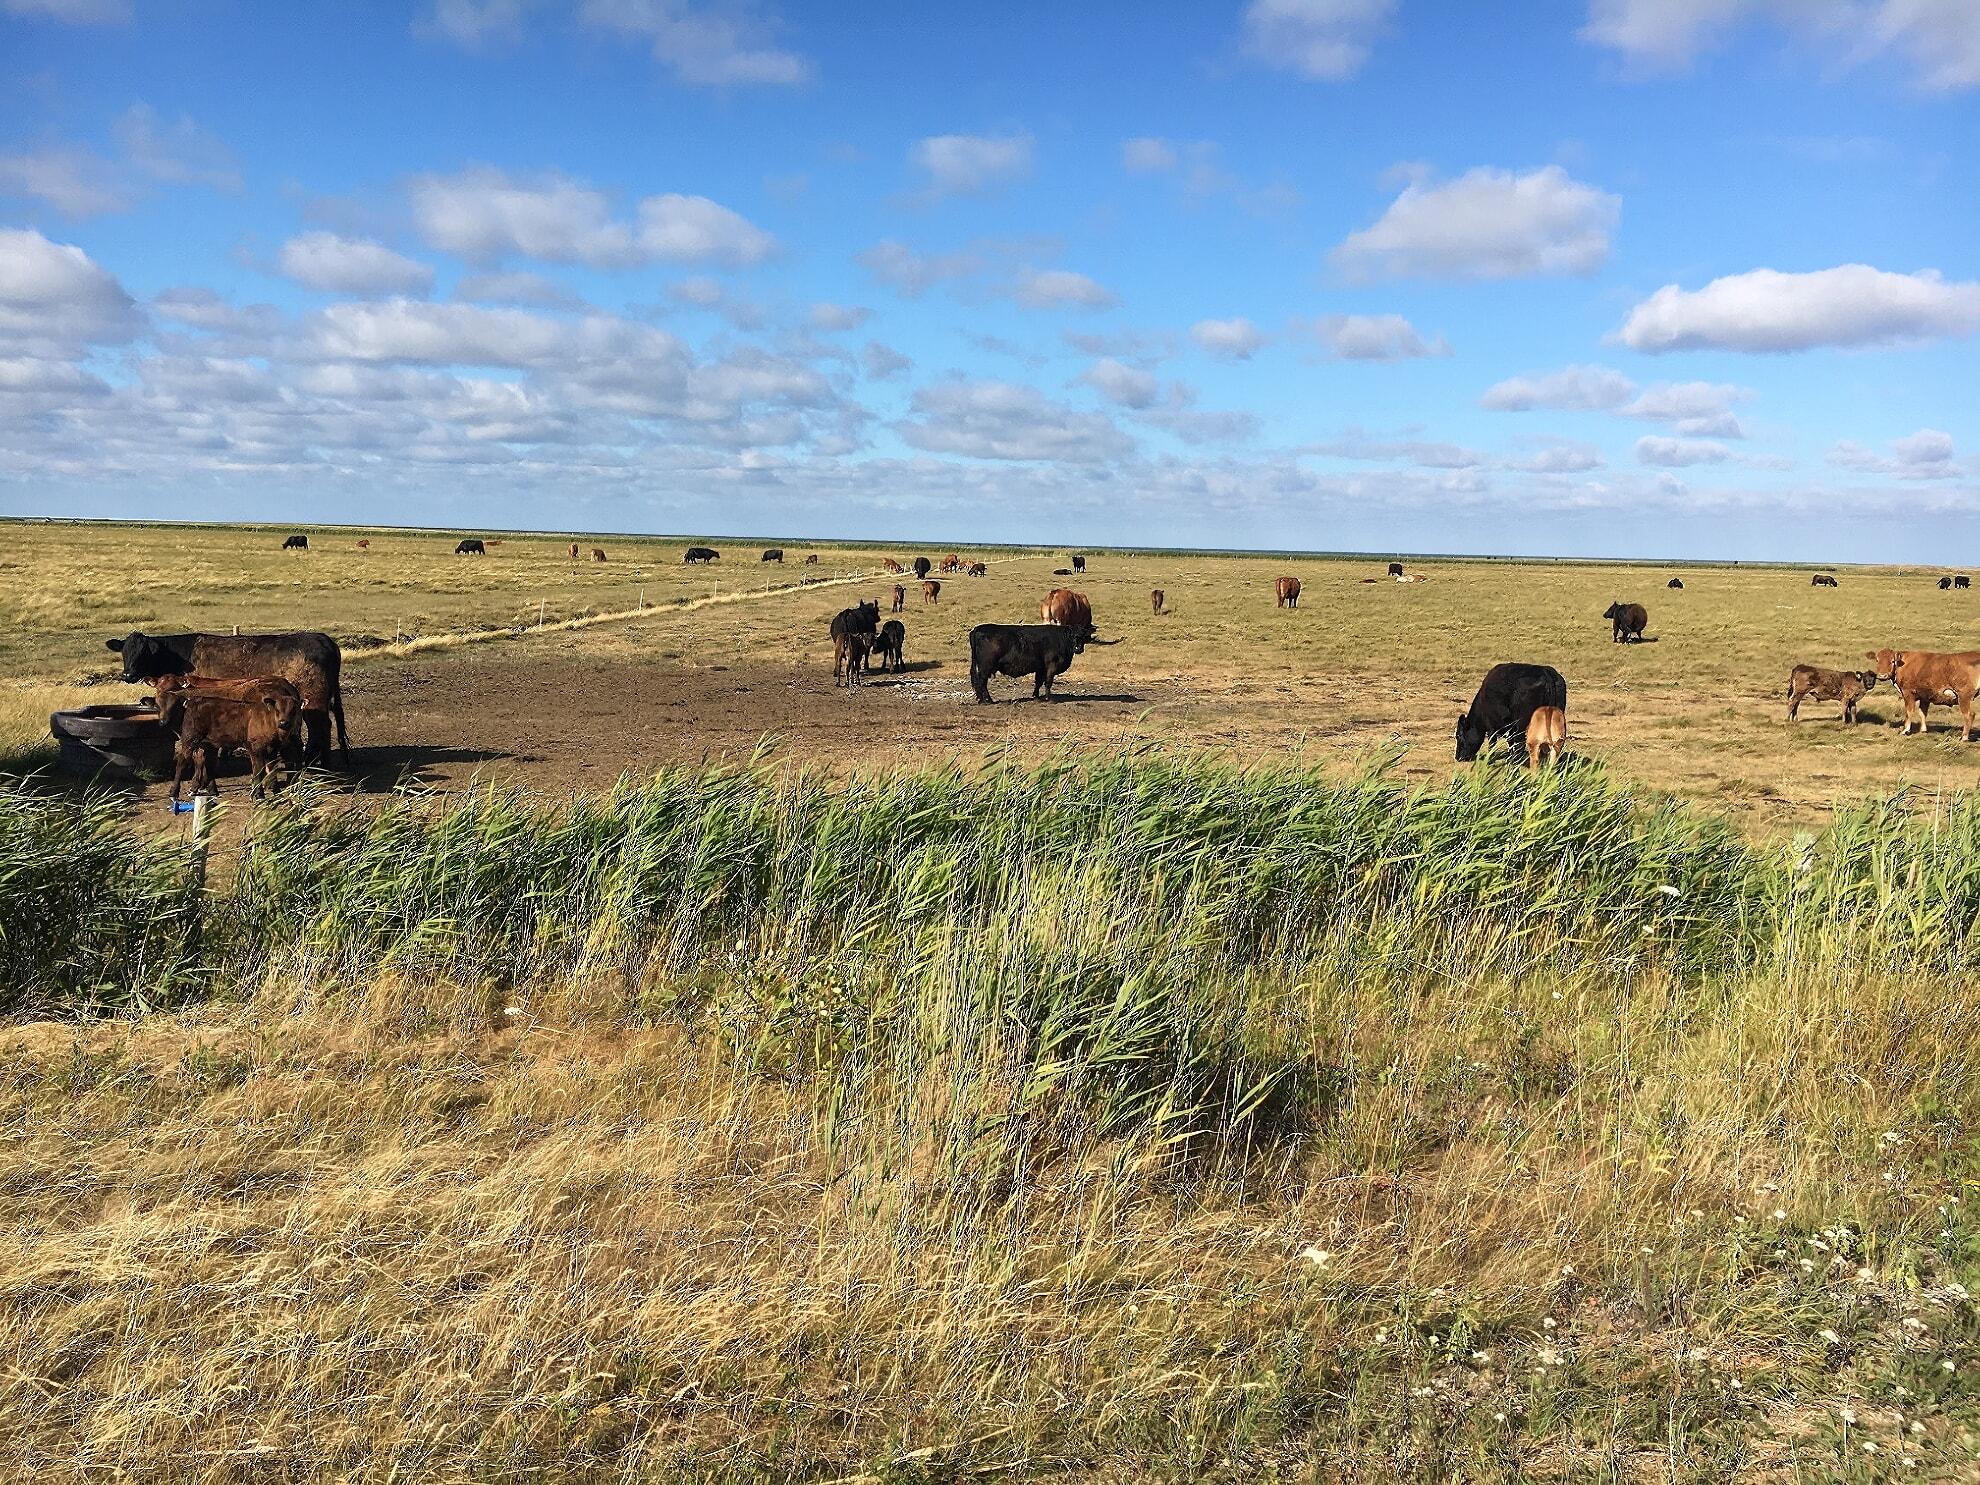 Kühe auf dem Weg